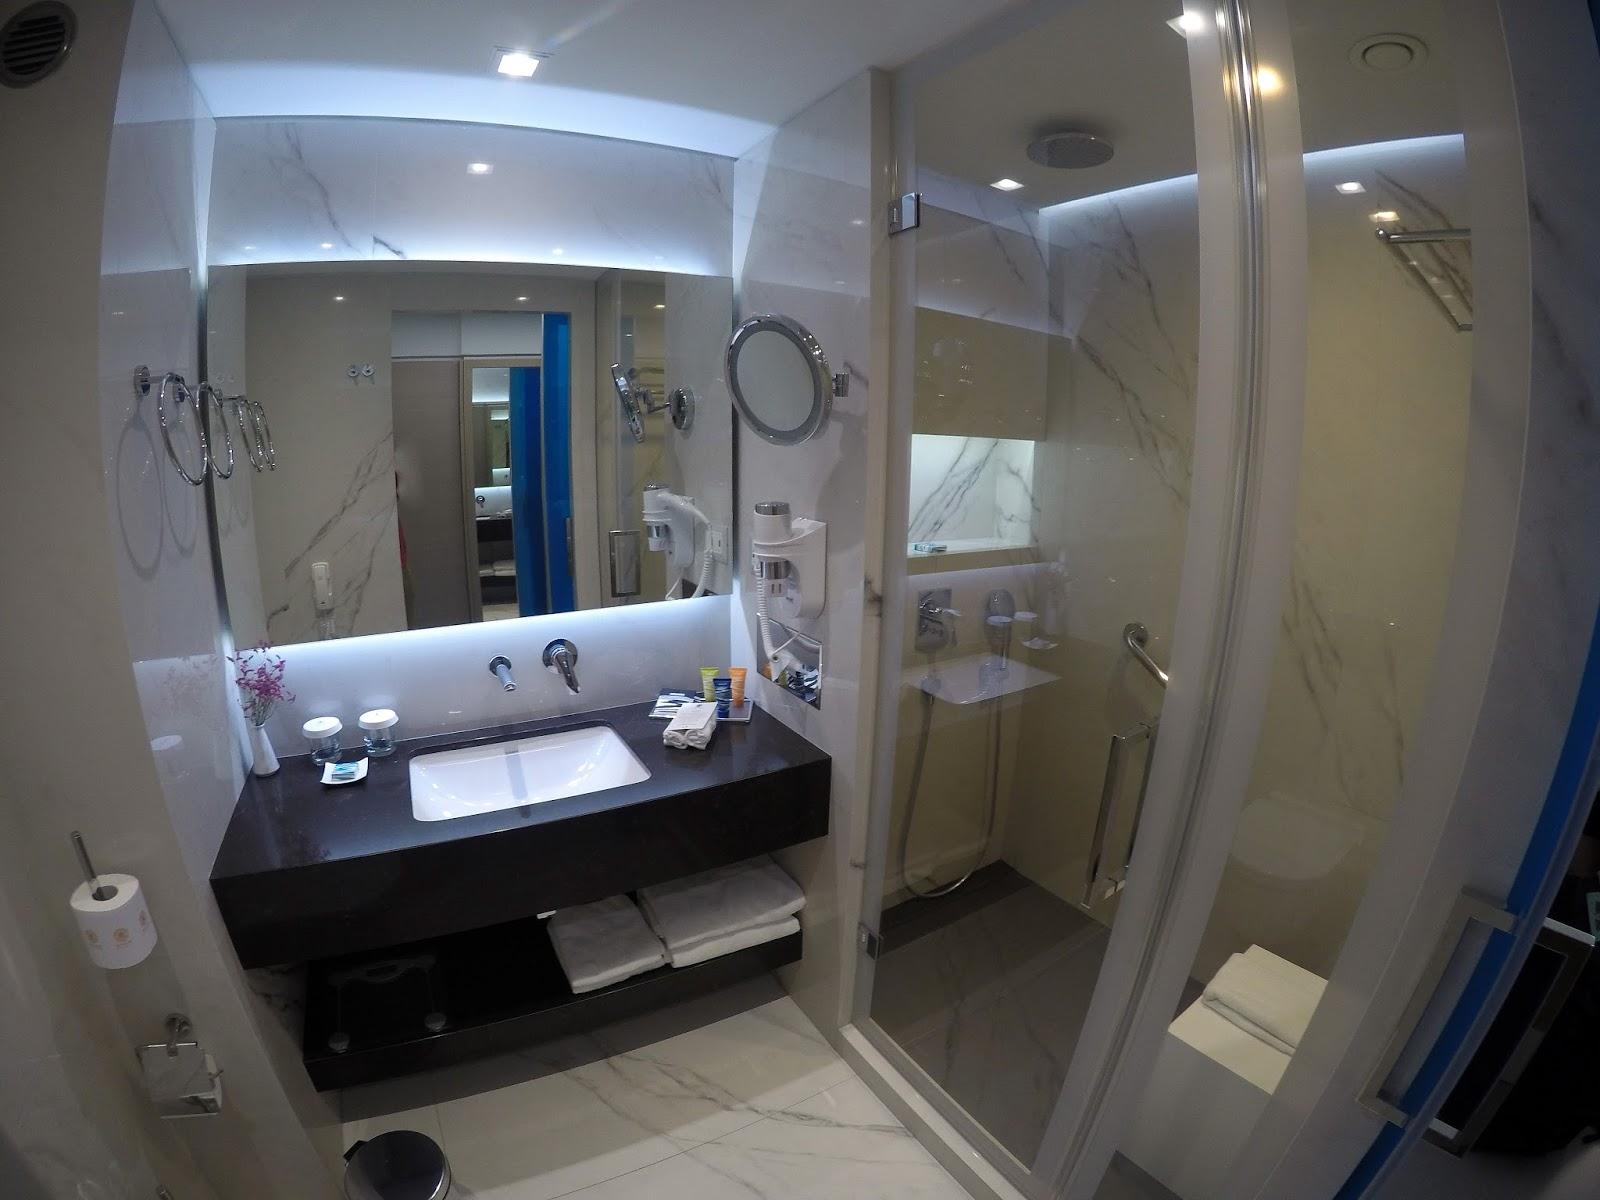 Neptune Hotel Kos Bathroom